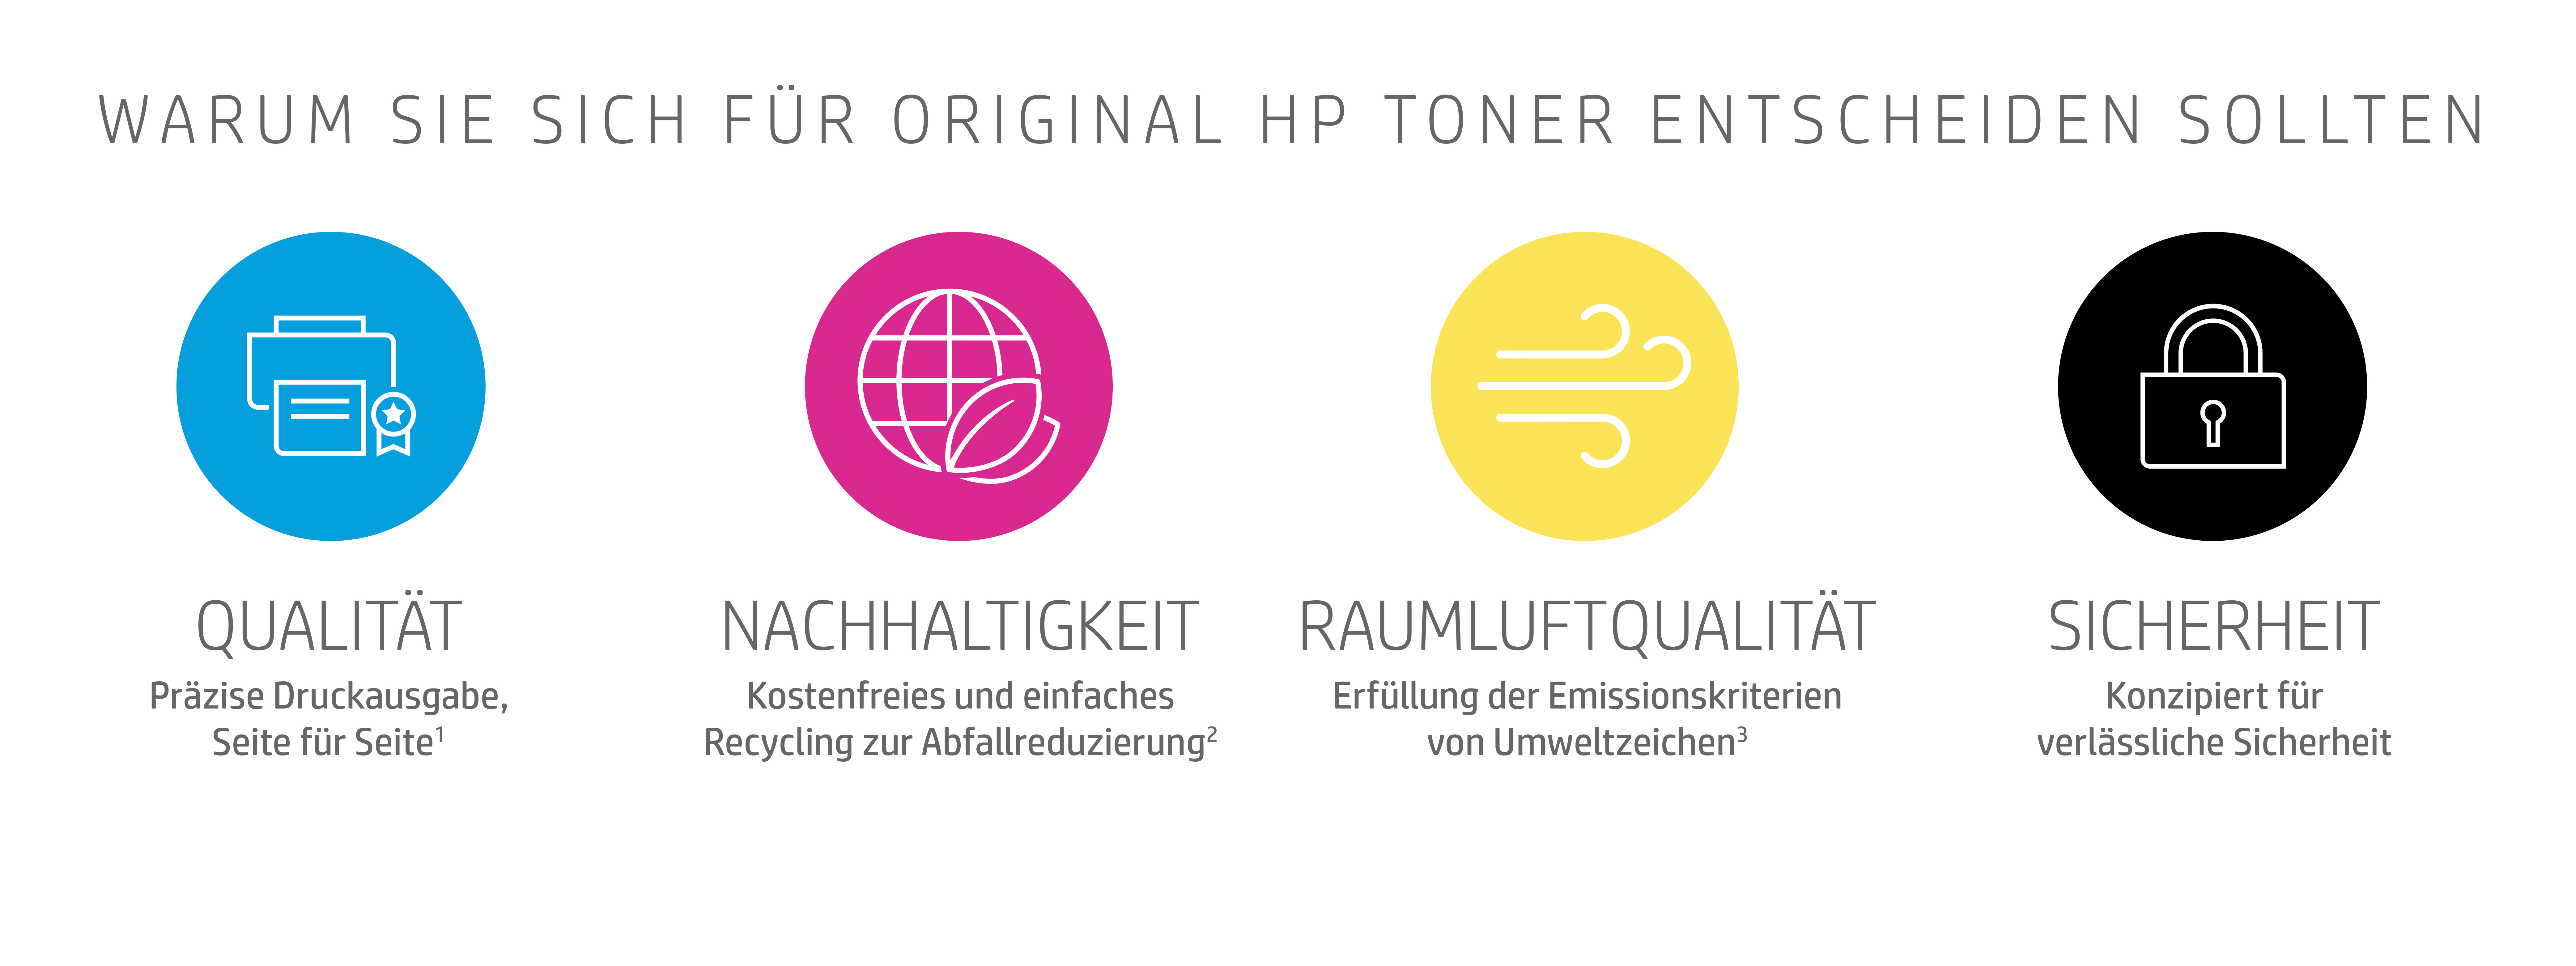 Hp Premium Store Hp 410 Toner